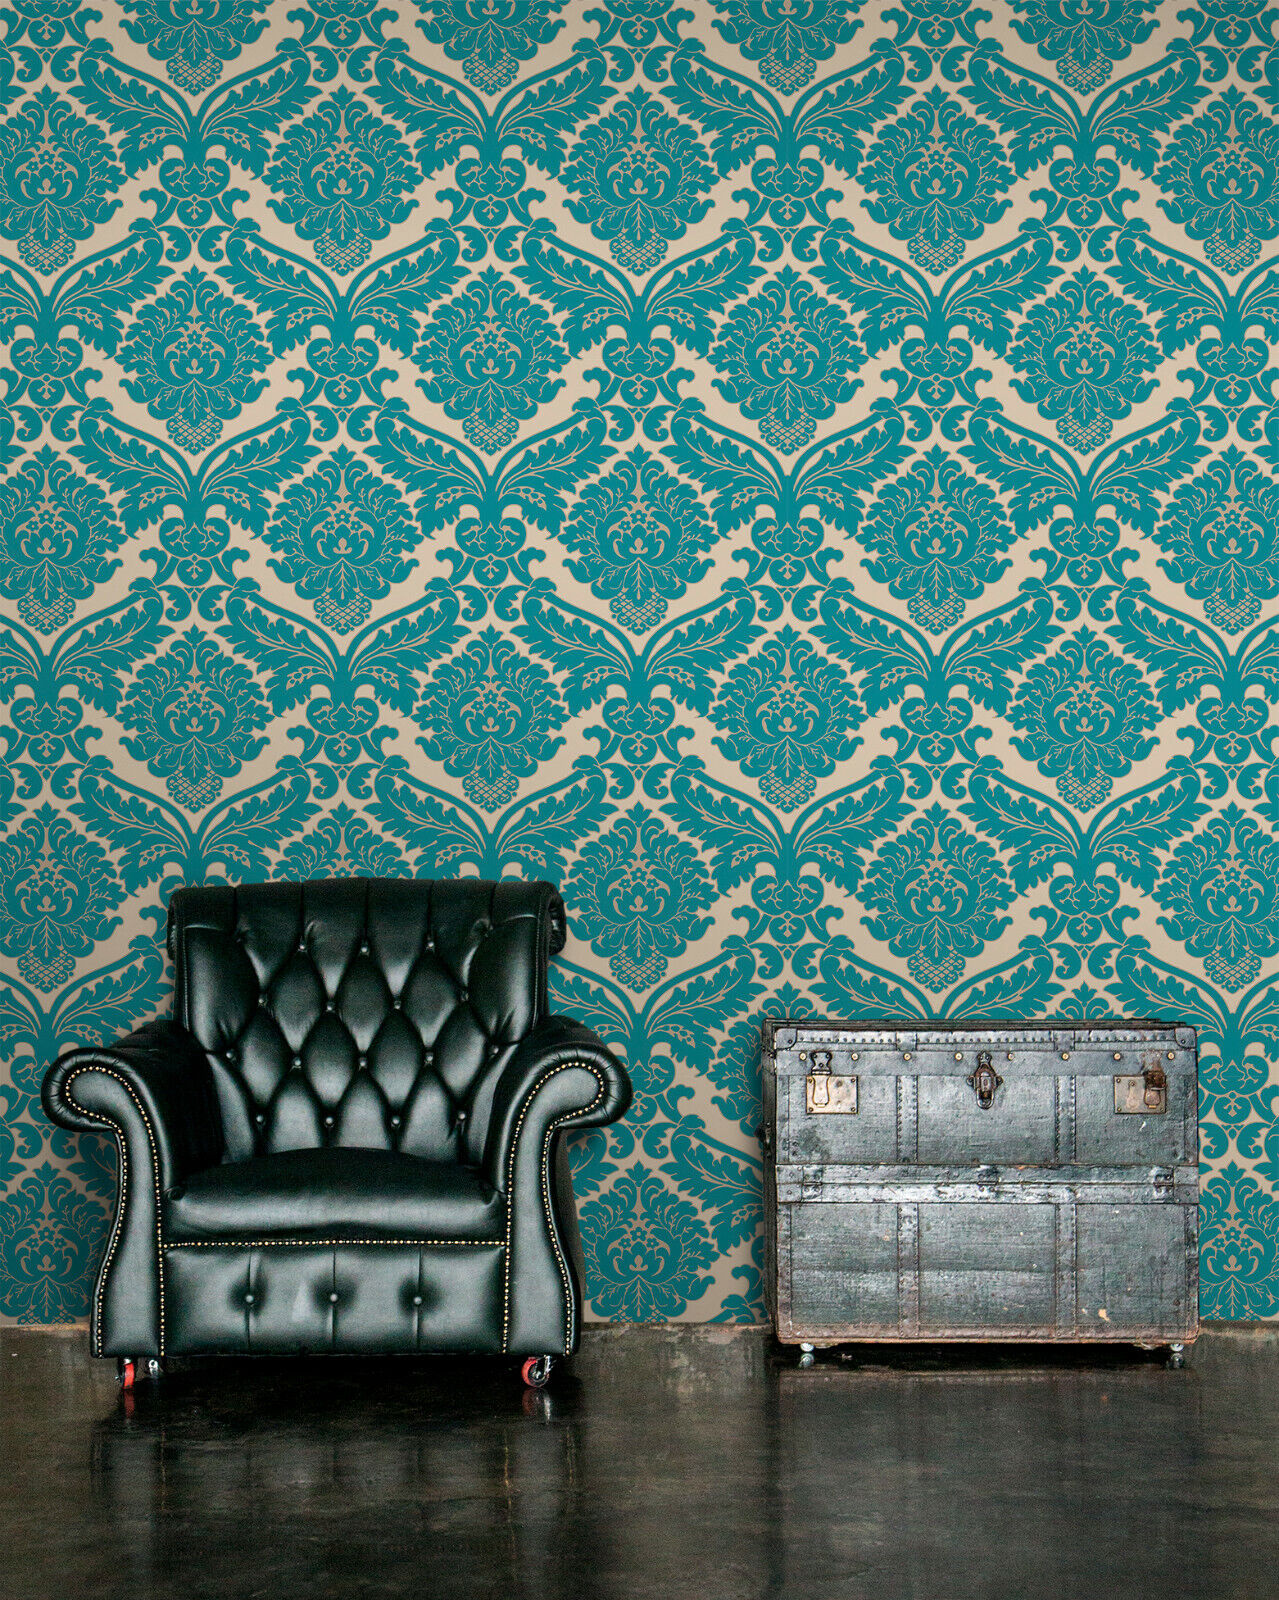 Vlies Tapete Barock Muster Ornament Metallic Effekt Turkis Gold Klassisch Ebay